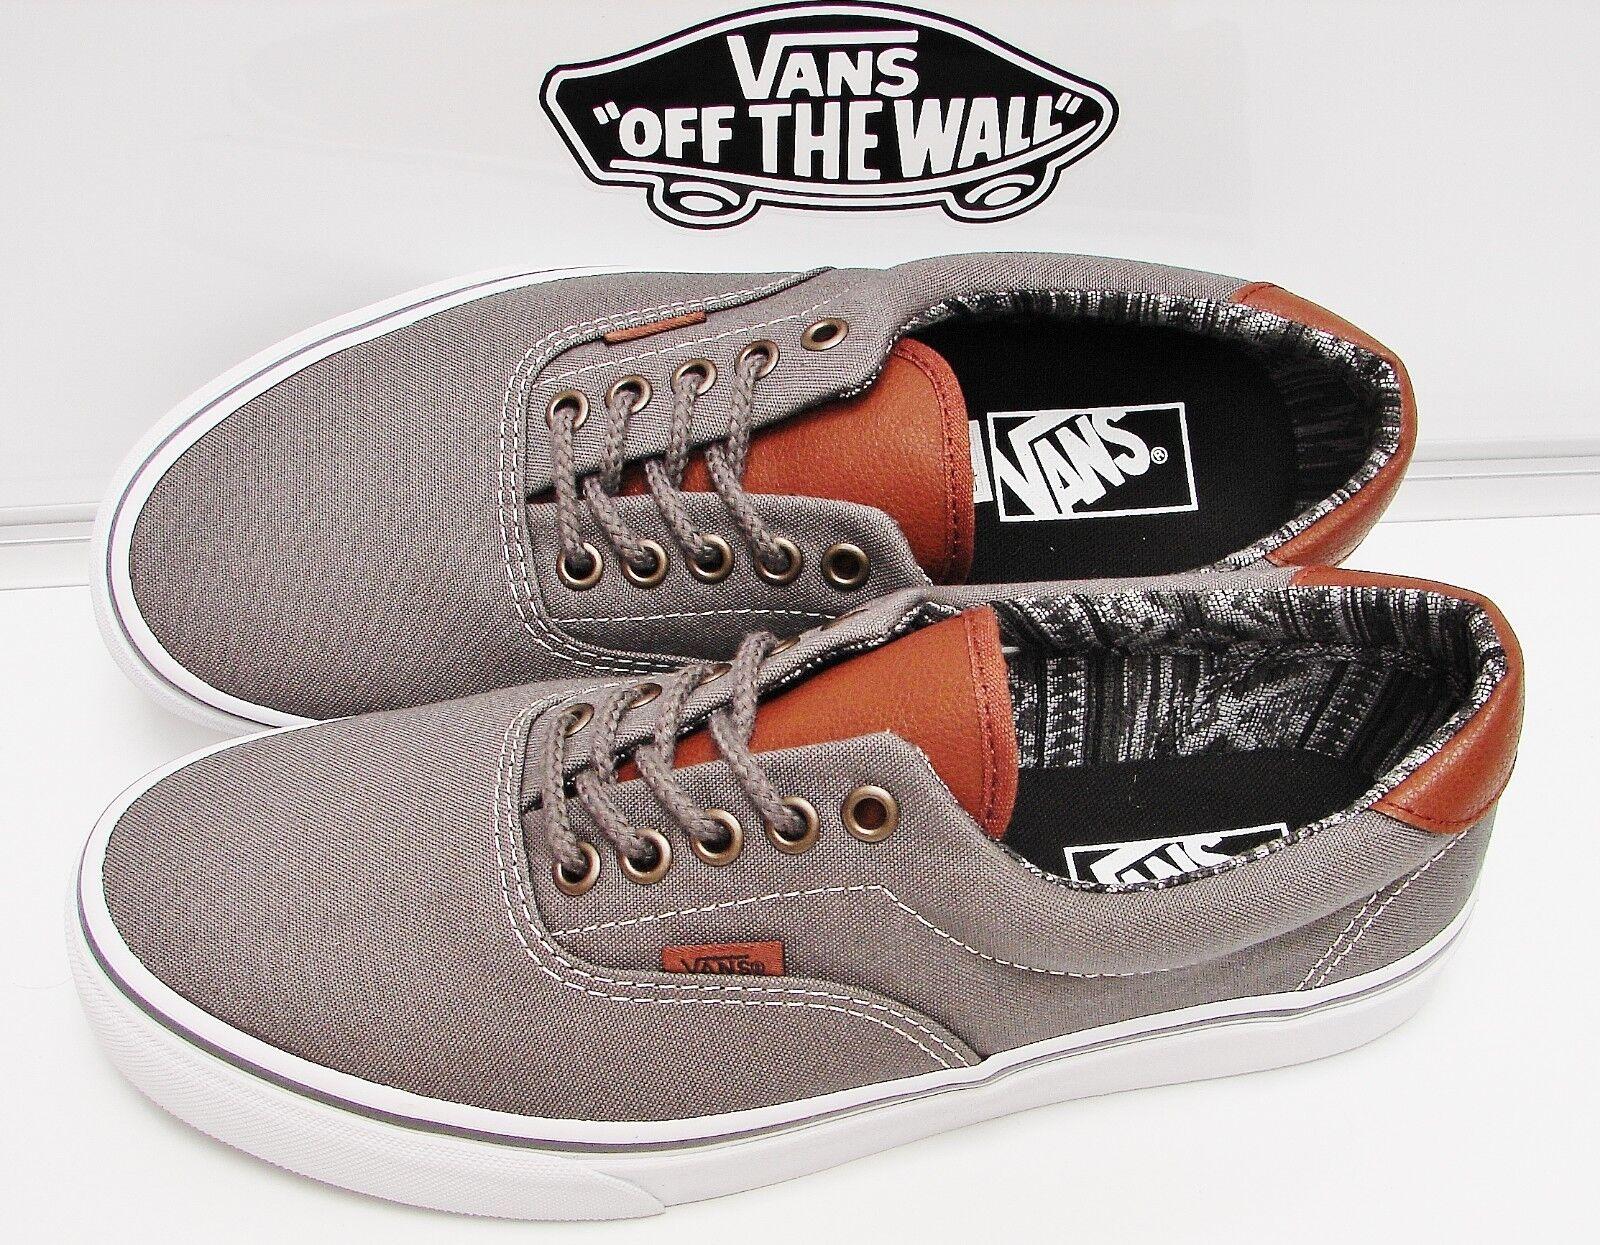 Vans Era 59 (C&L)Pewter Italian Italian Italian Weave VN-0A3458LW9 Men's Size 7 8cc33f